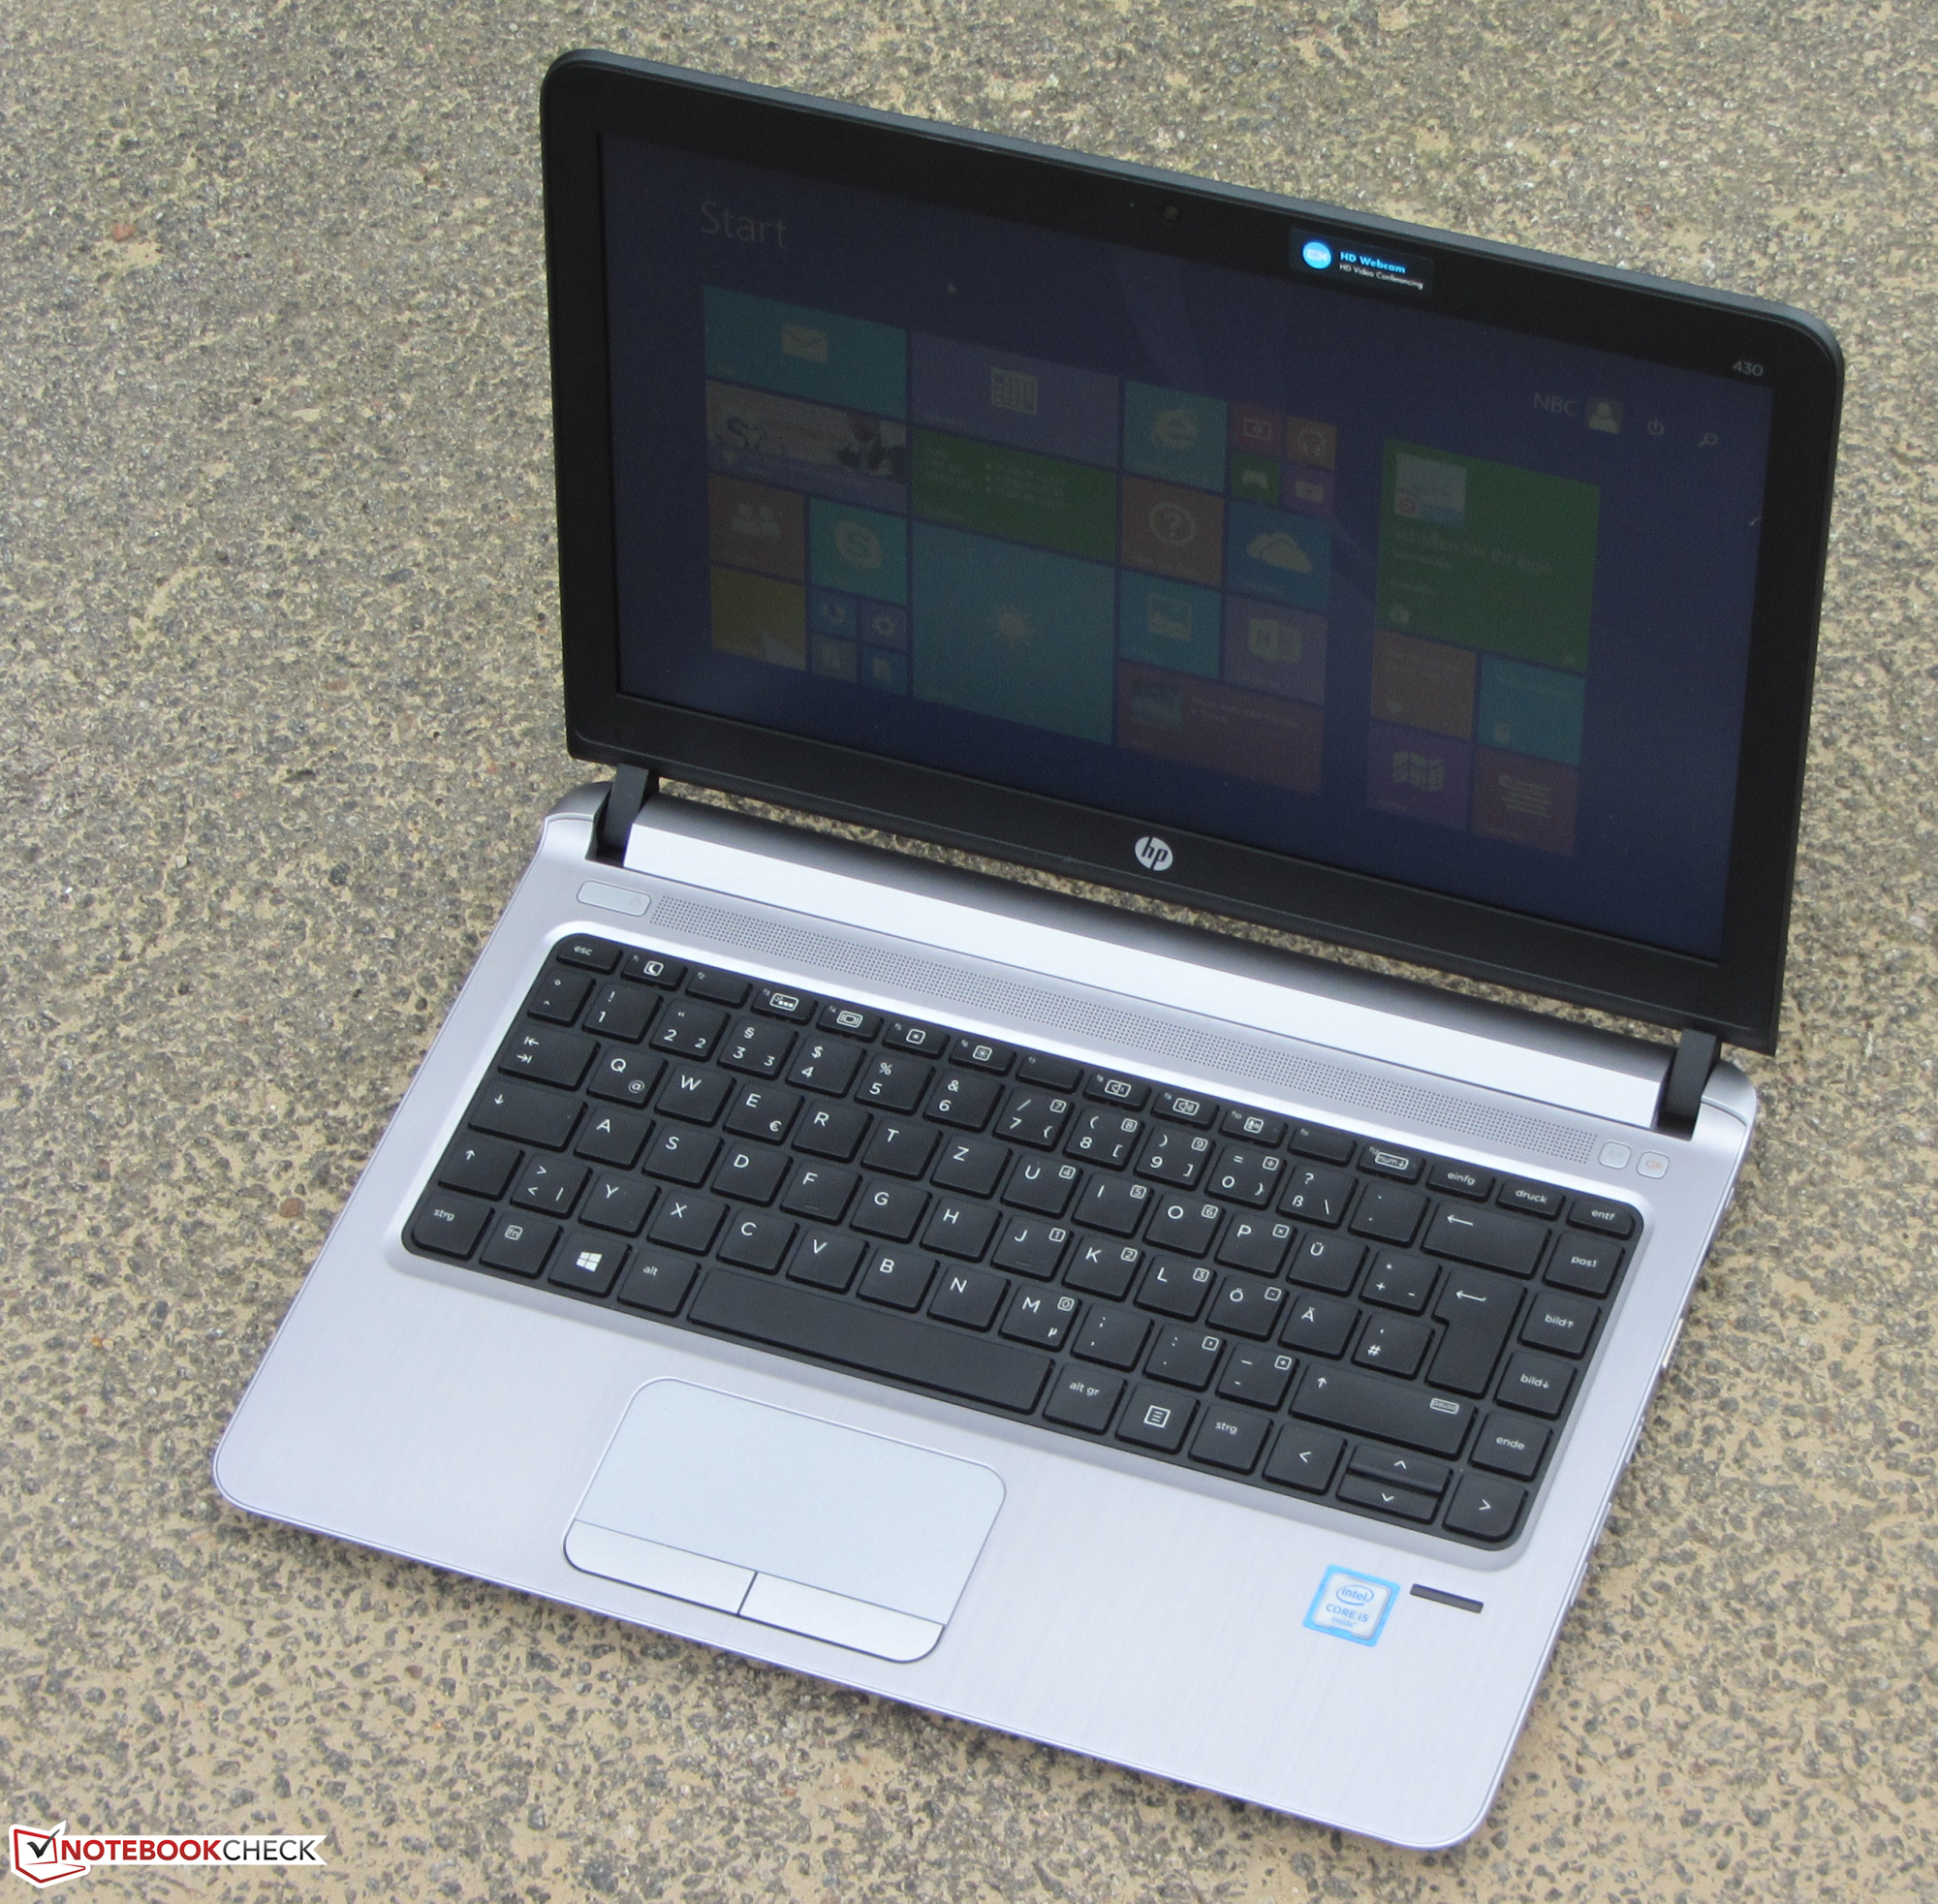 HP ProBook 430 G3 Intel WLAN Driver for PC